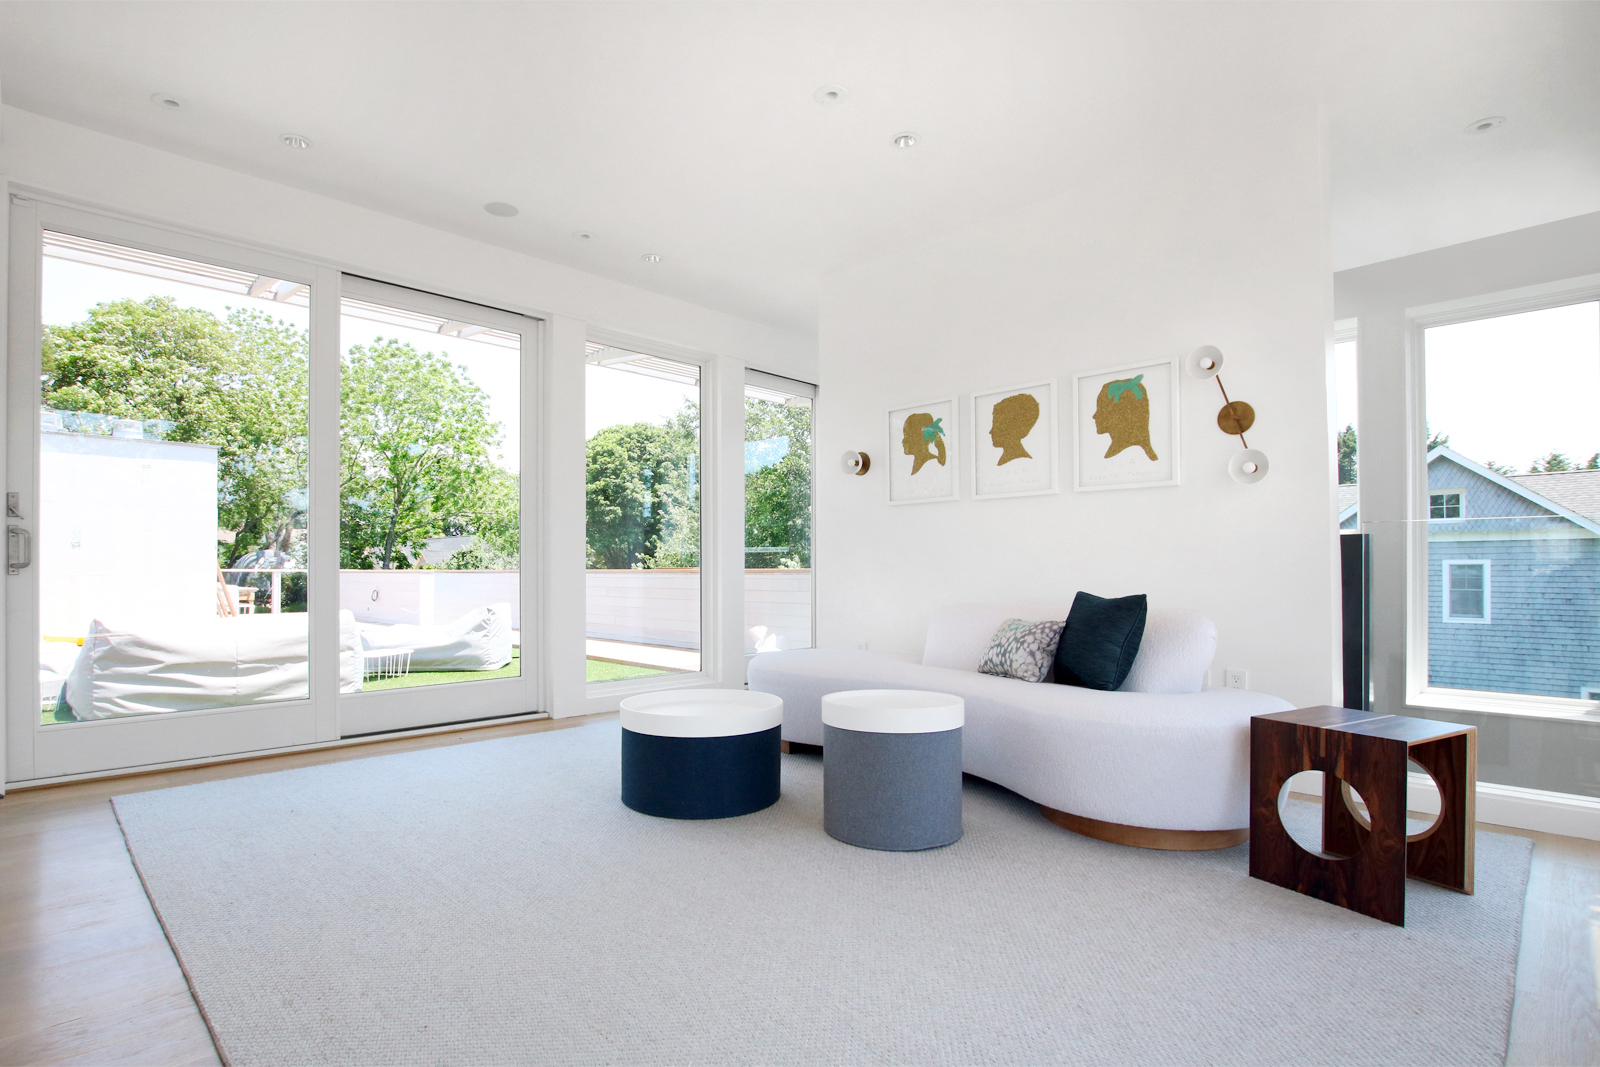 20-re4a-resolution-4-architecture-modern-modular-prefab-bridgehampton house-interior-family-room.jpg